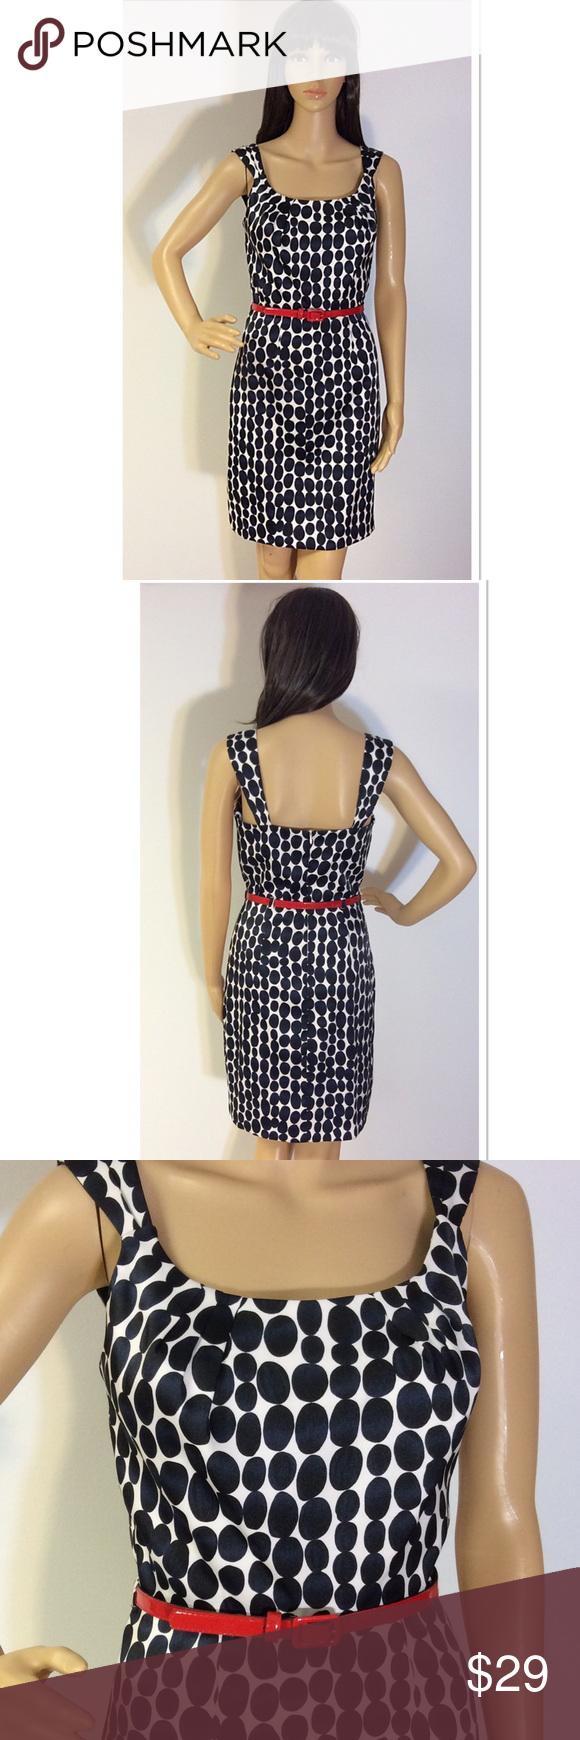 A byer navy uwhite polka dot dress with red belt